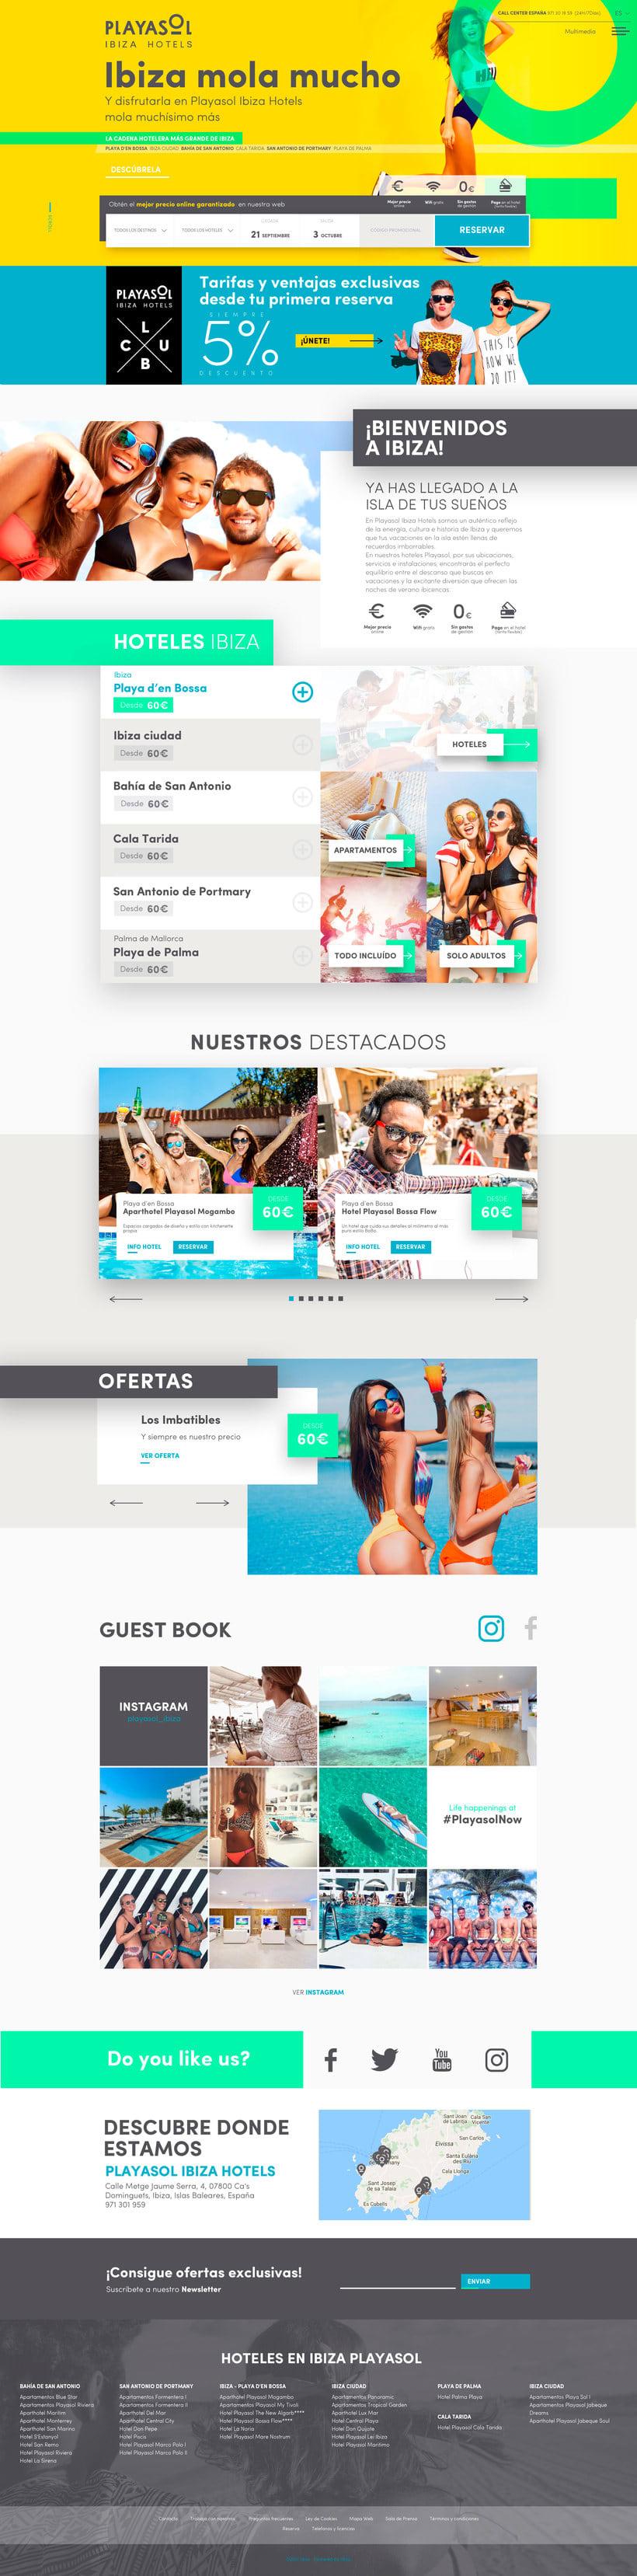 Web Playasol Ibiza Hotels  0